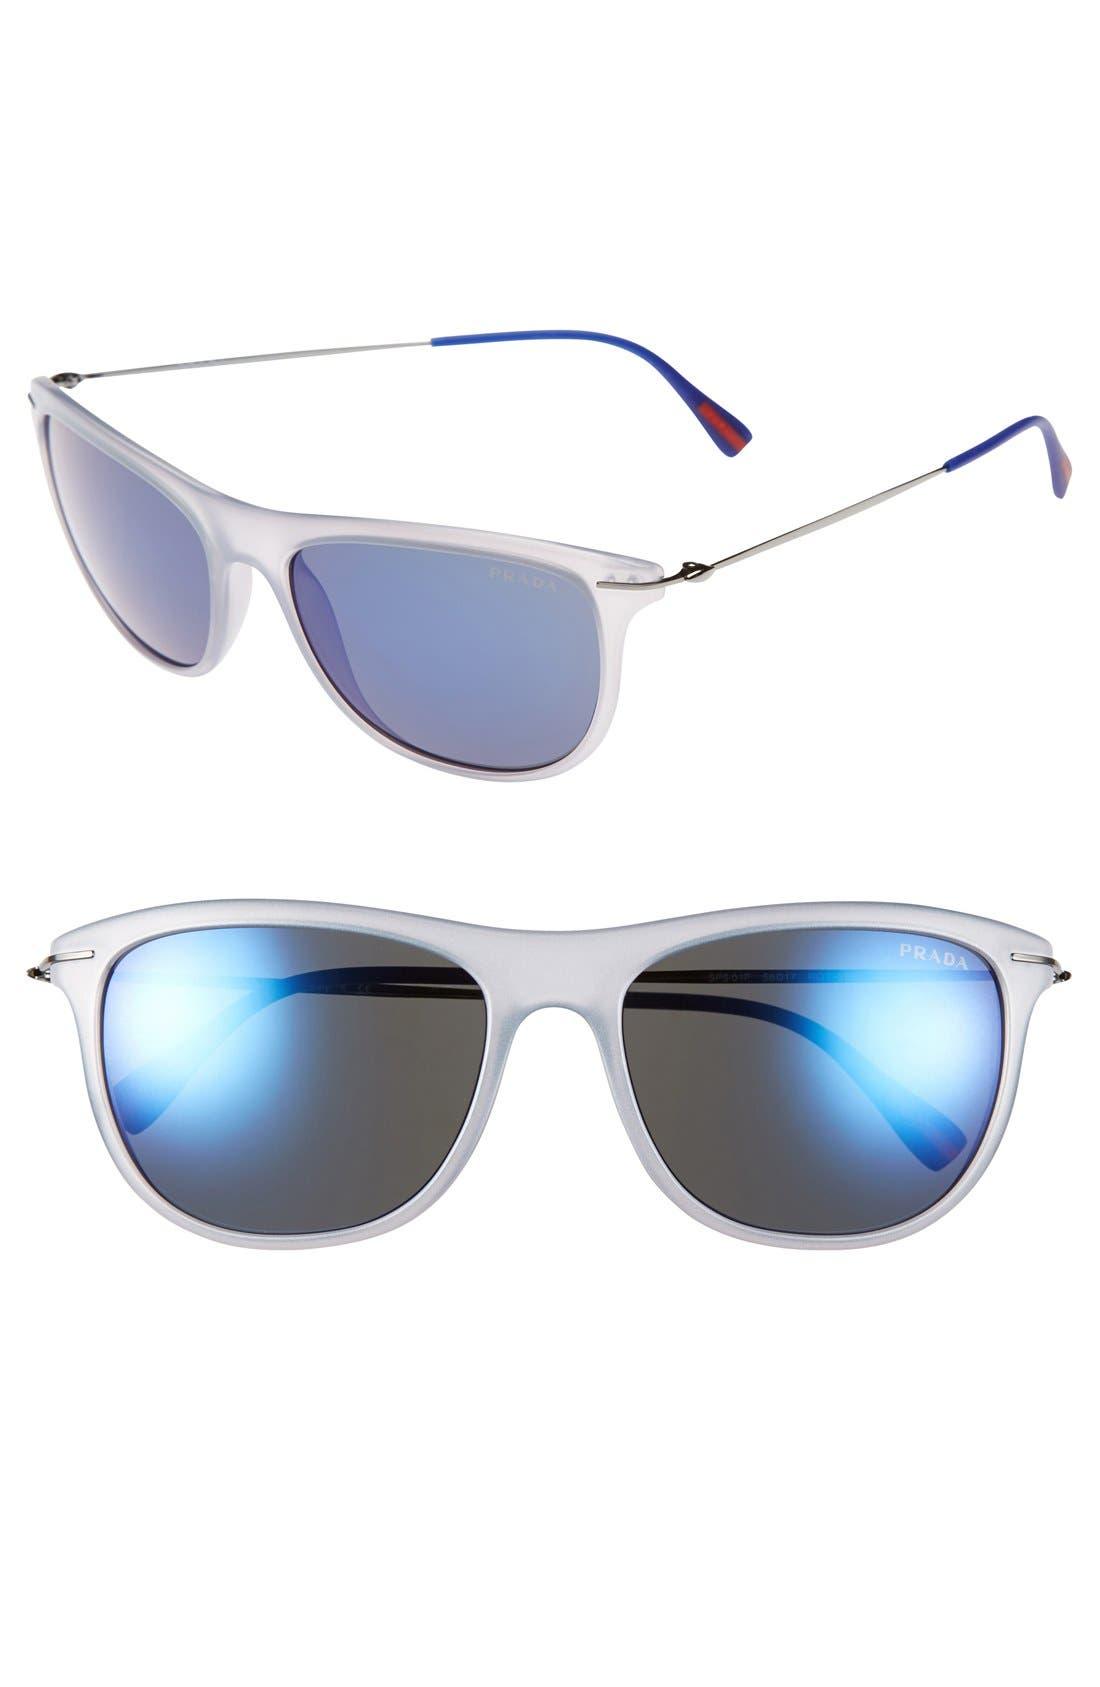 Main Image - Prada 'Pilot' 56mm Sunglasses